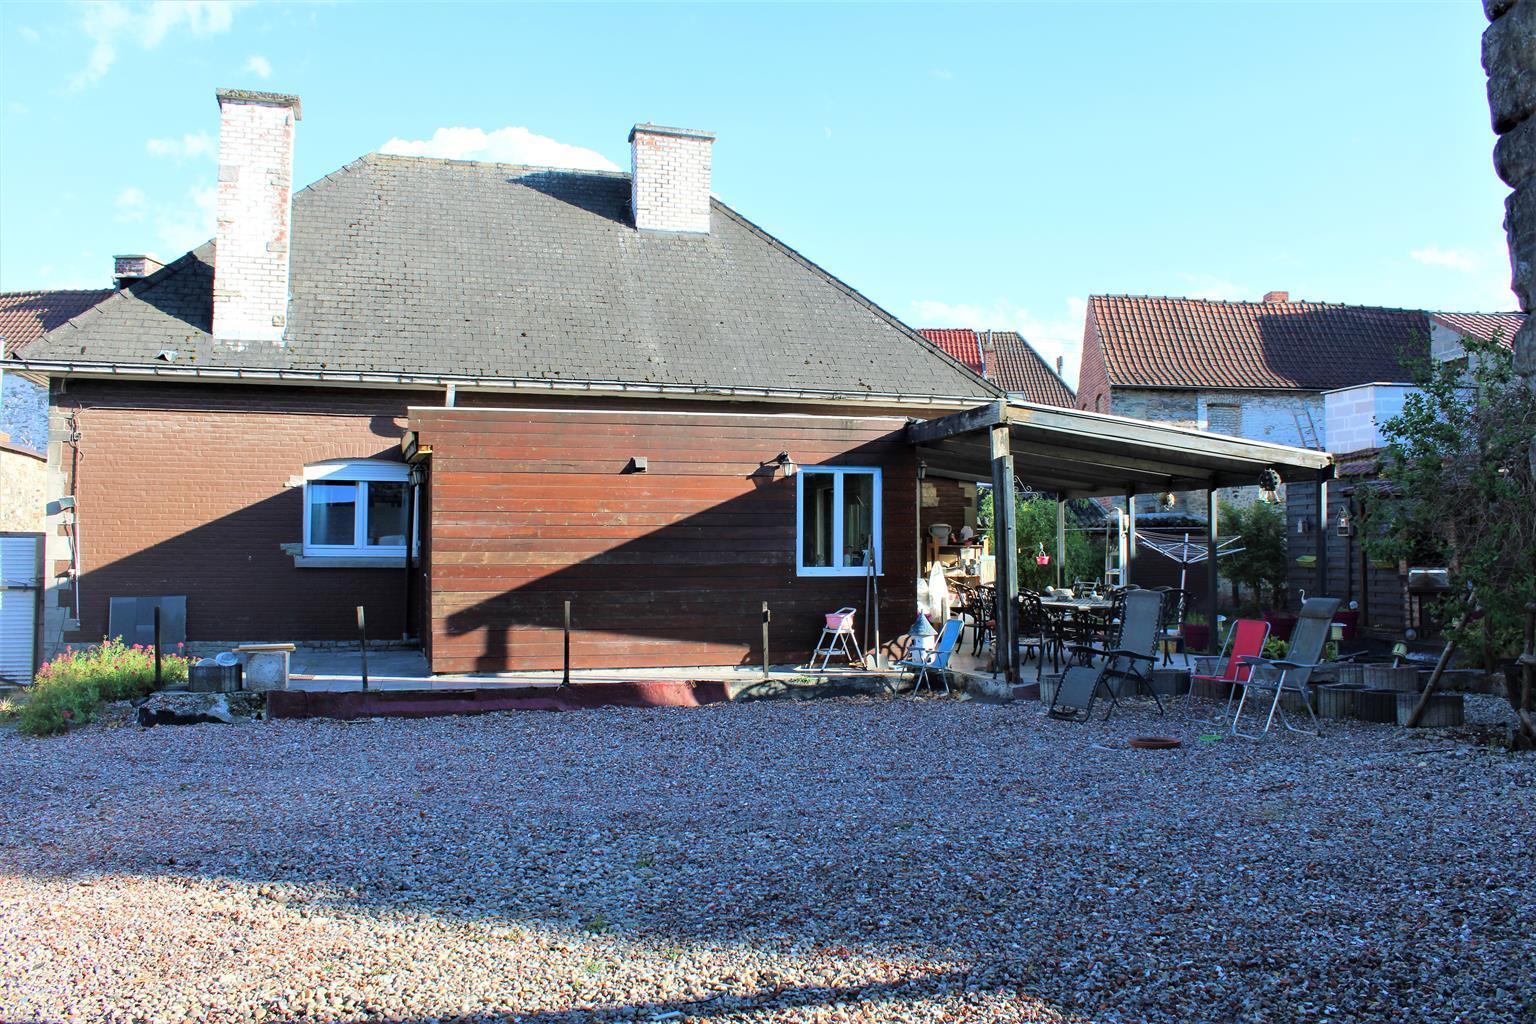 Maison - Antoing Calonne - #4297159-23